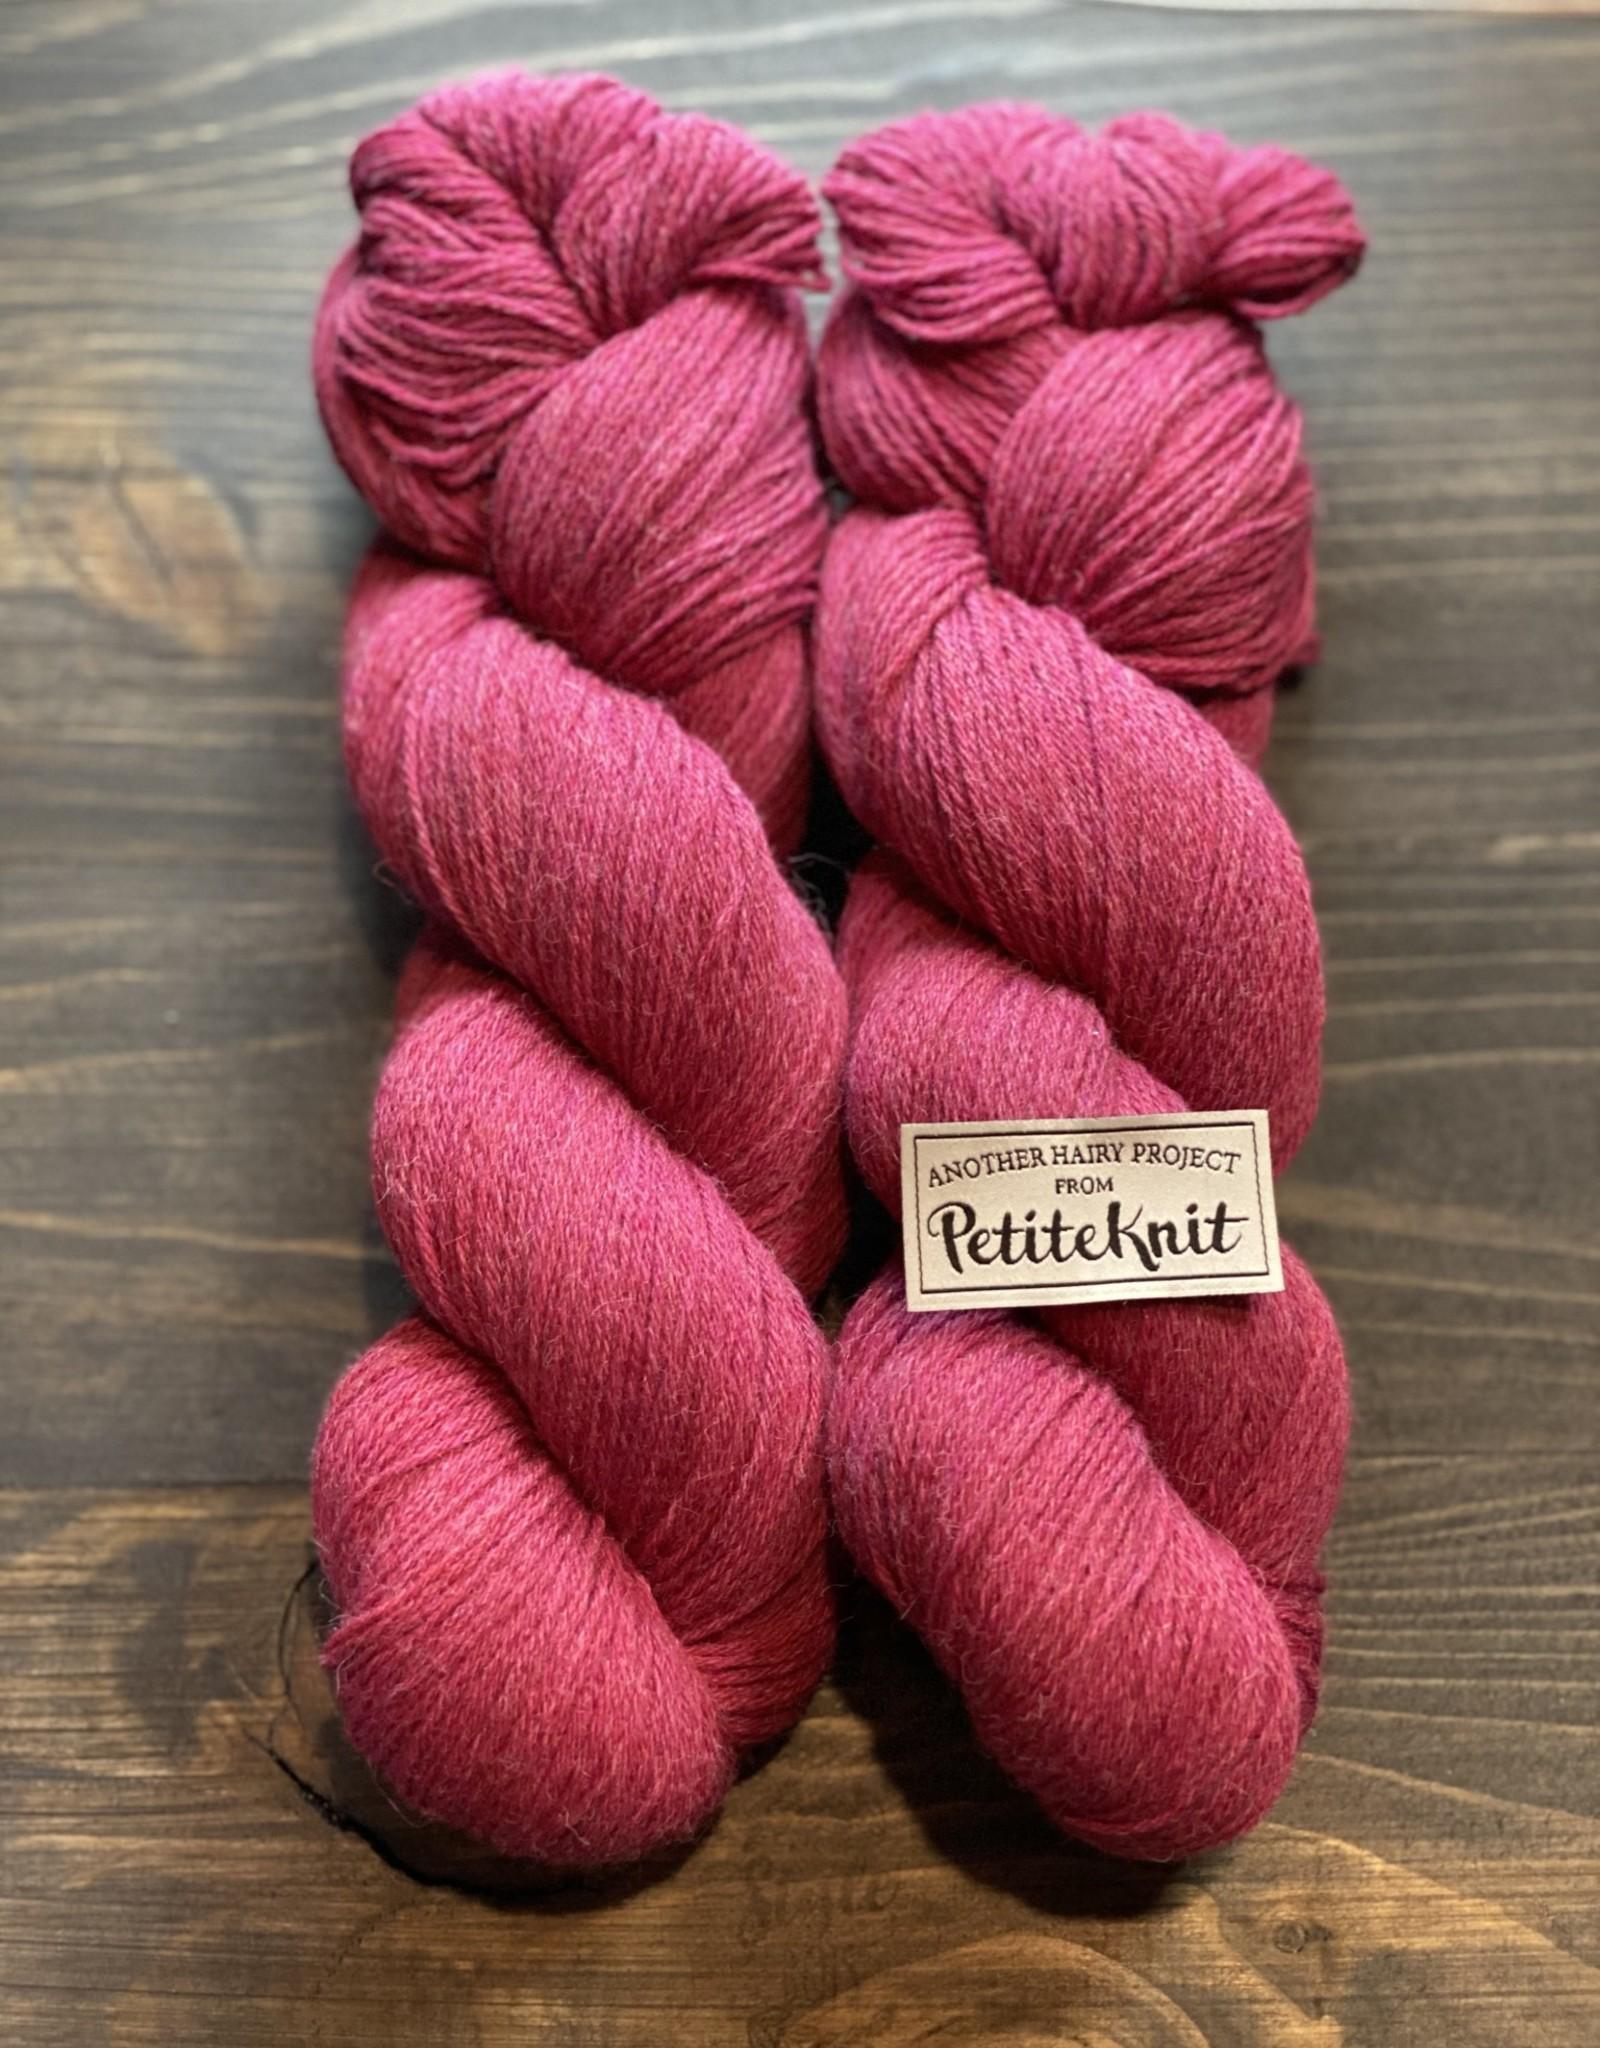 Pelotes & Cie Kit tuque Oslo - Rose